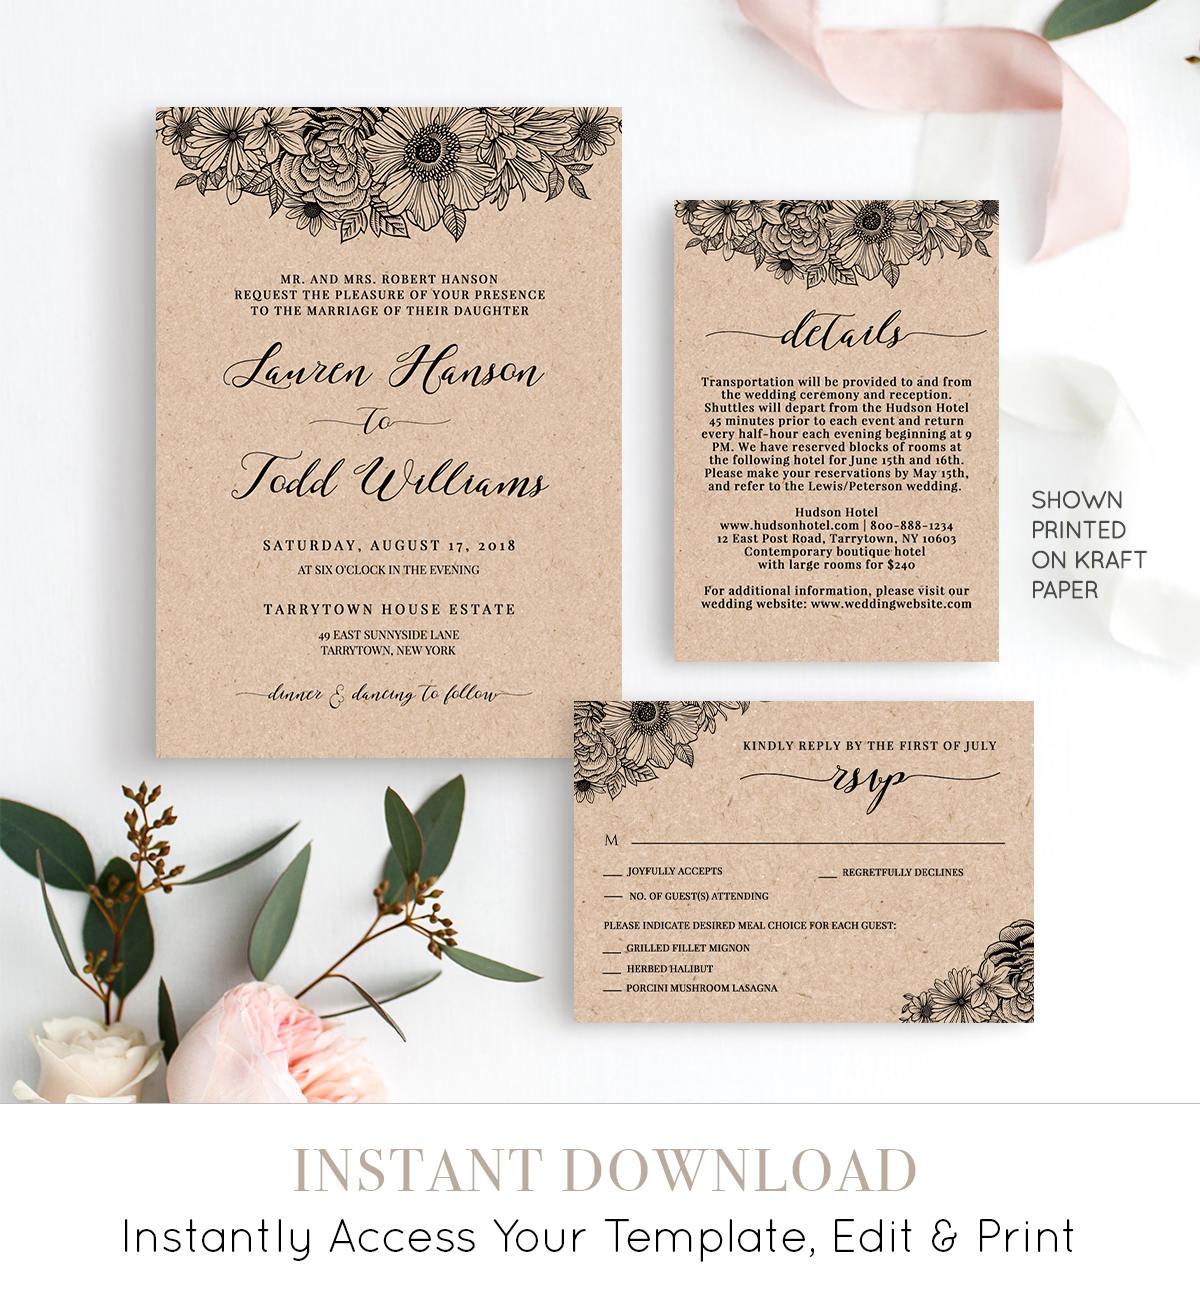 Diy Wedding Invitations Pinterest: Wedding Invitation Set, Rustic Floral Wedding Invite